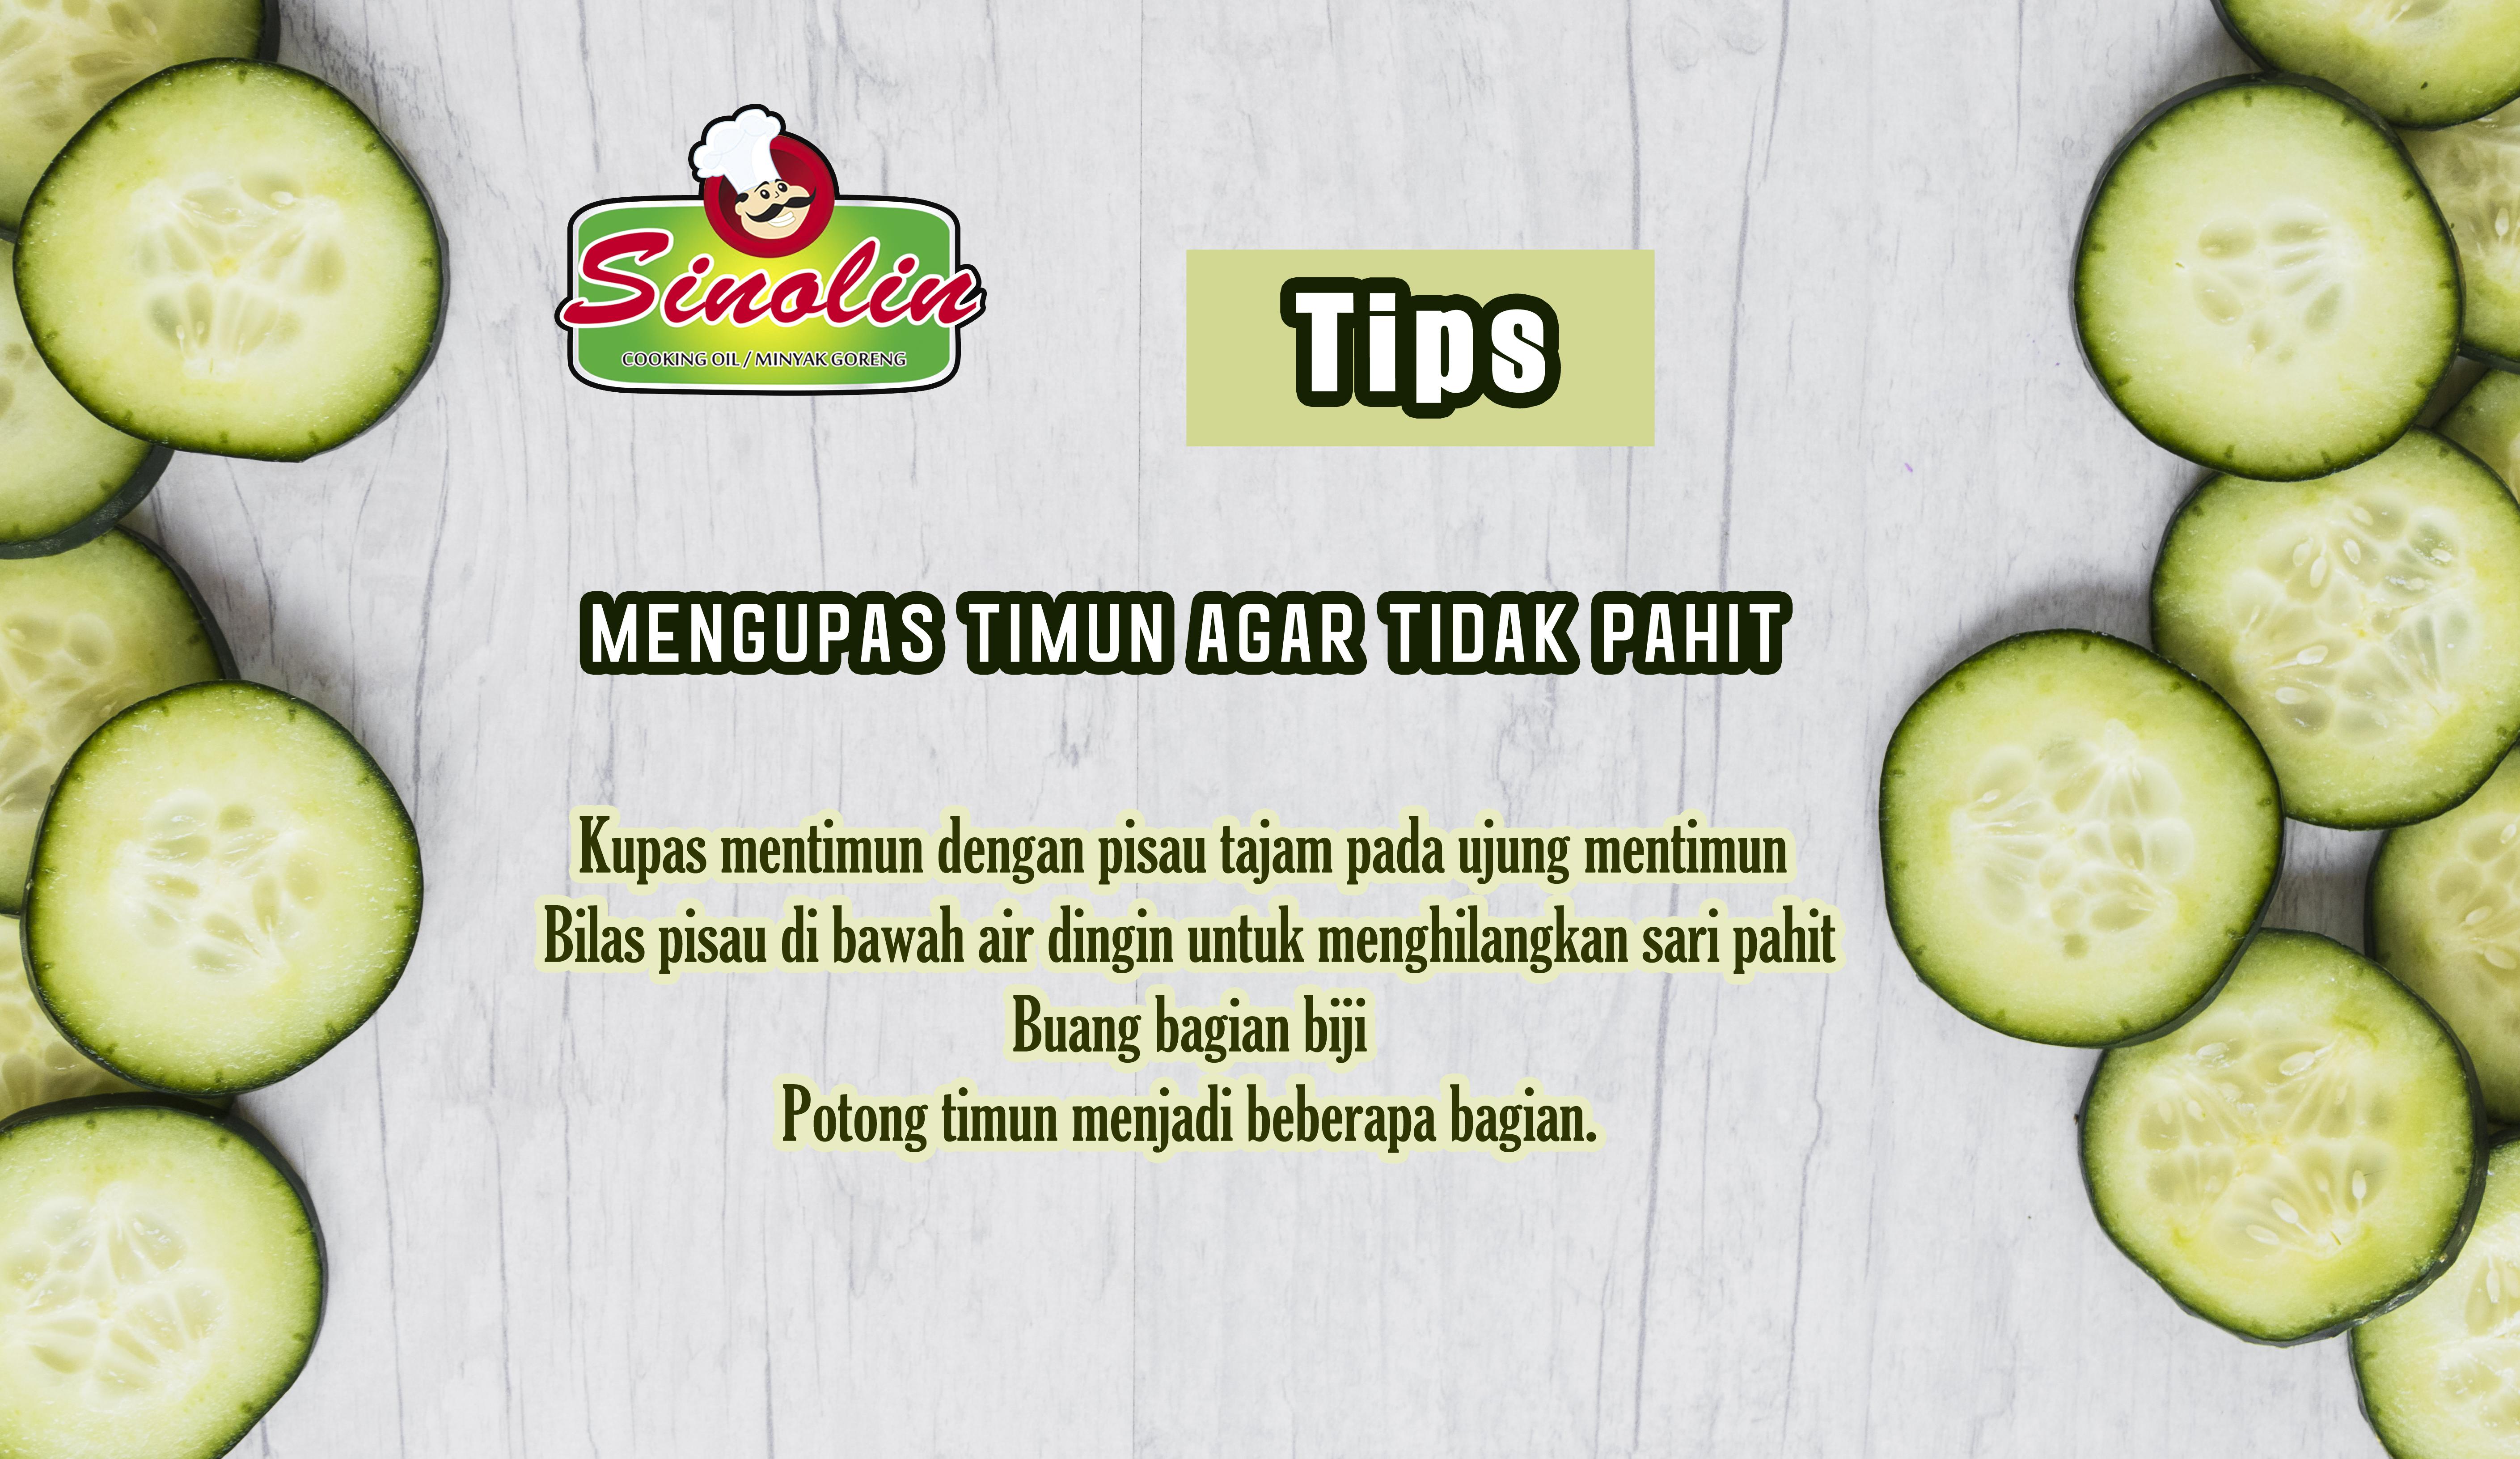 Tips: Peeling Cucumber So Not Bitter By Dapur Sinolin